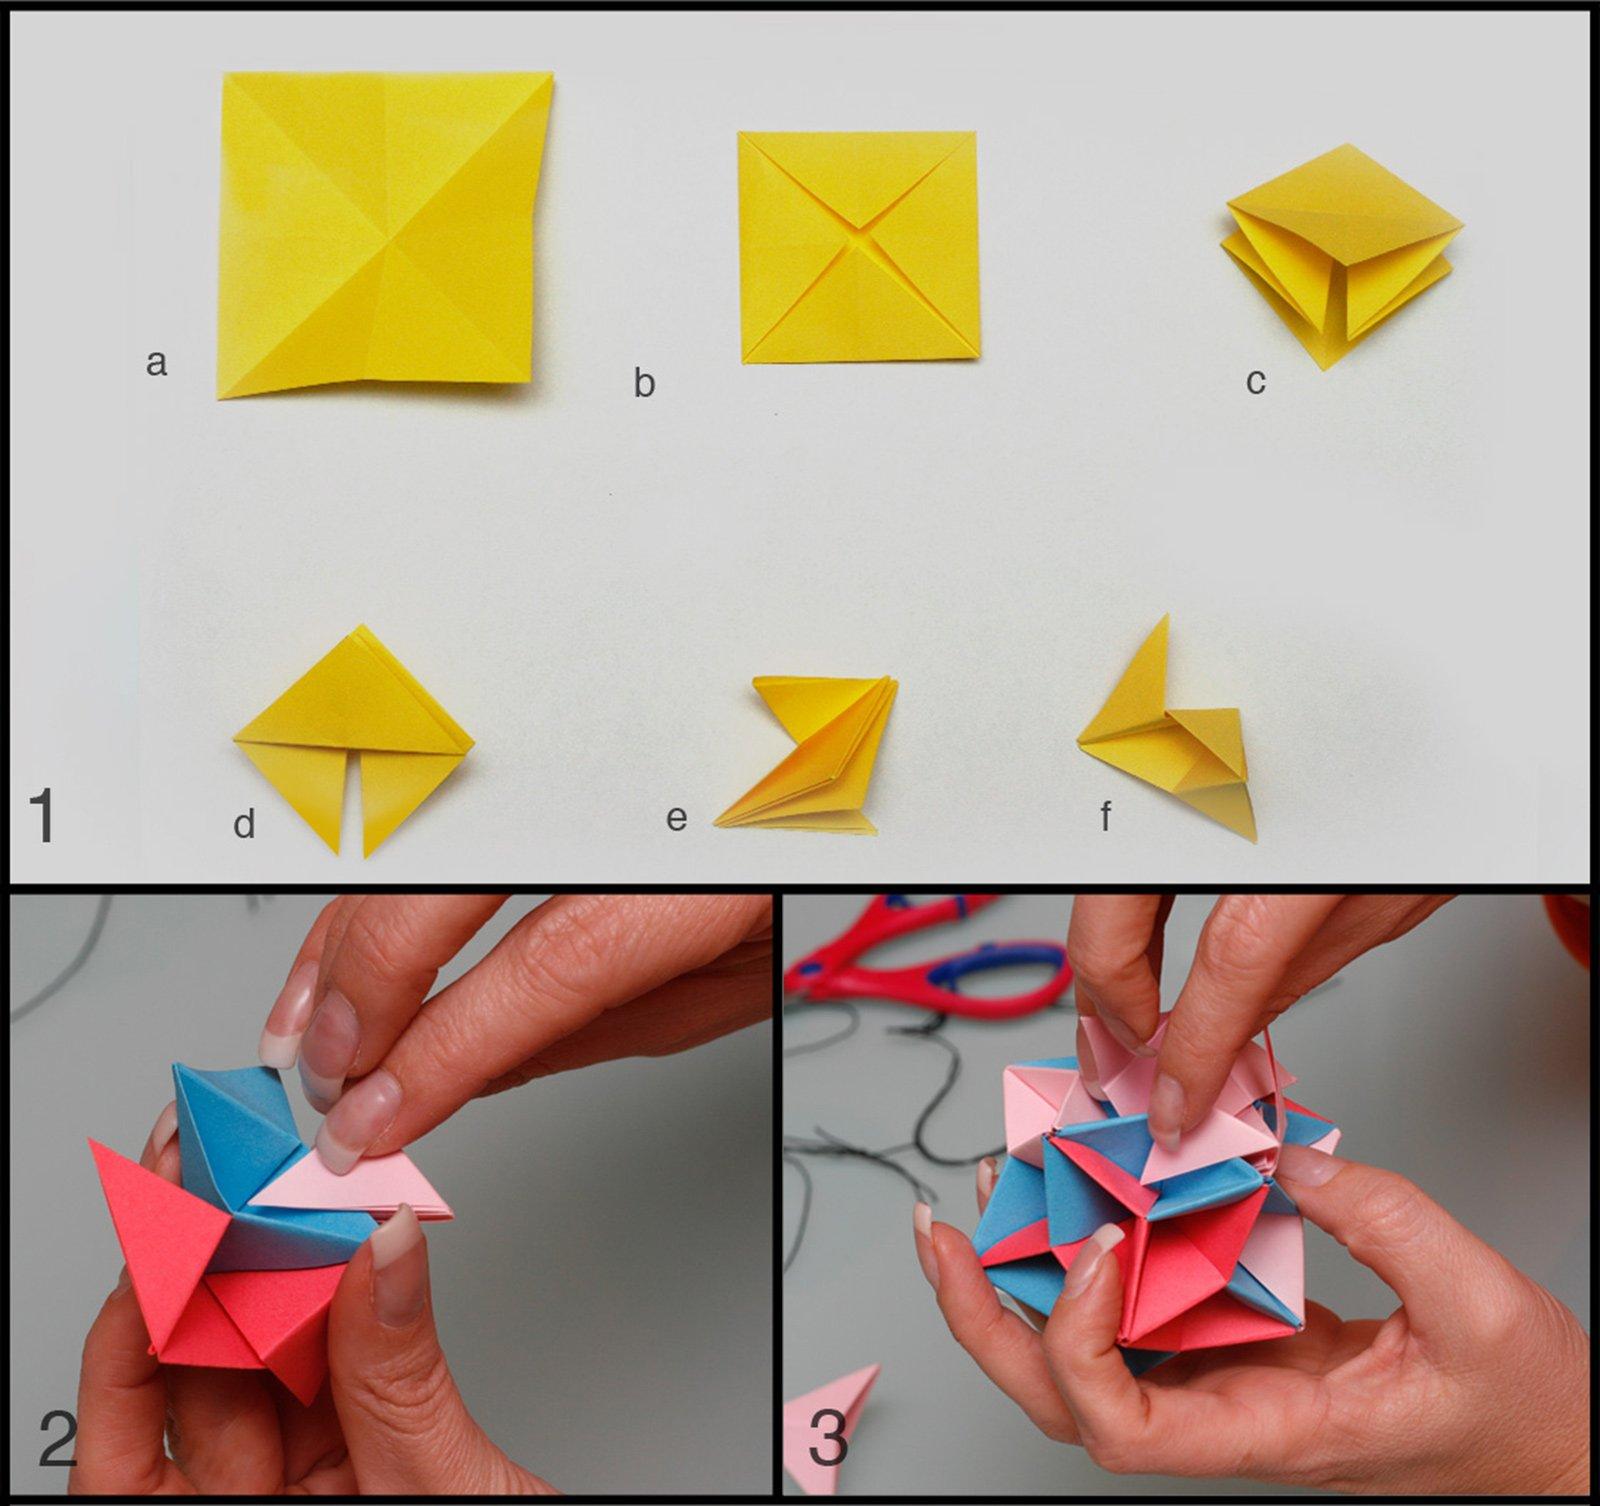 Decorazioni di natale origami cose di casa - Decorazioni per finestre di natale fai da te ...